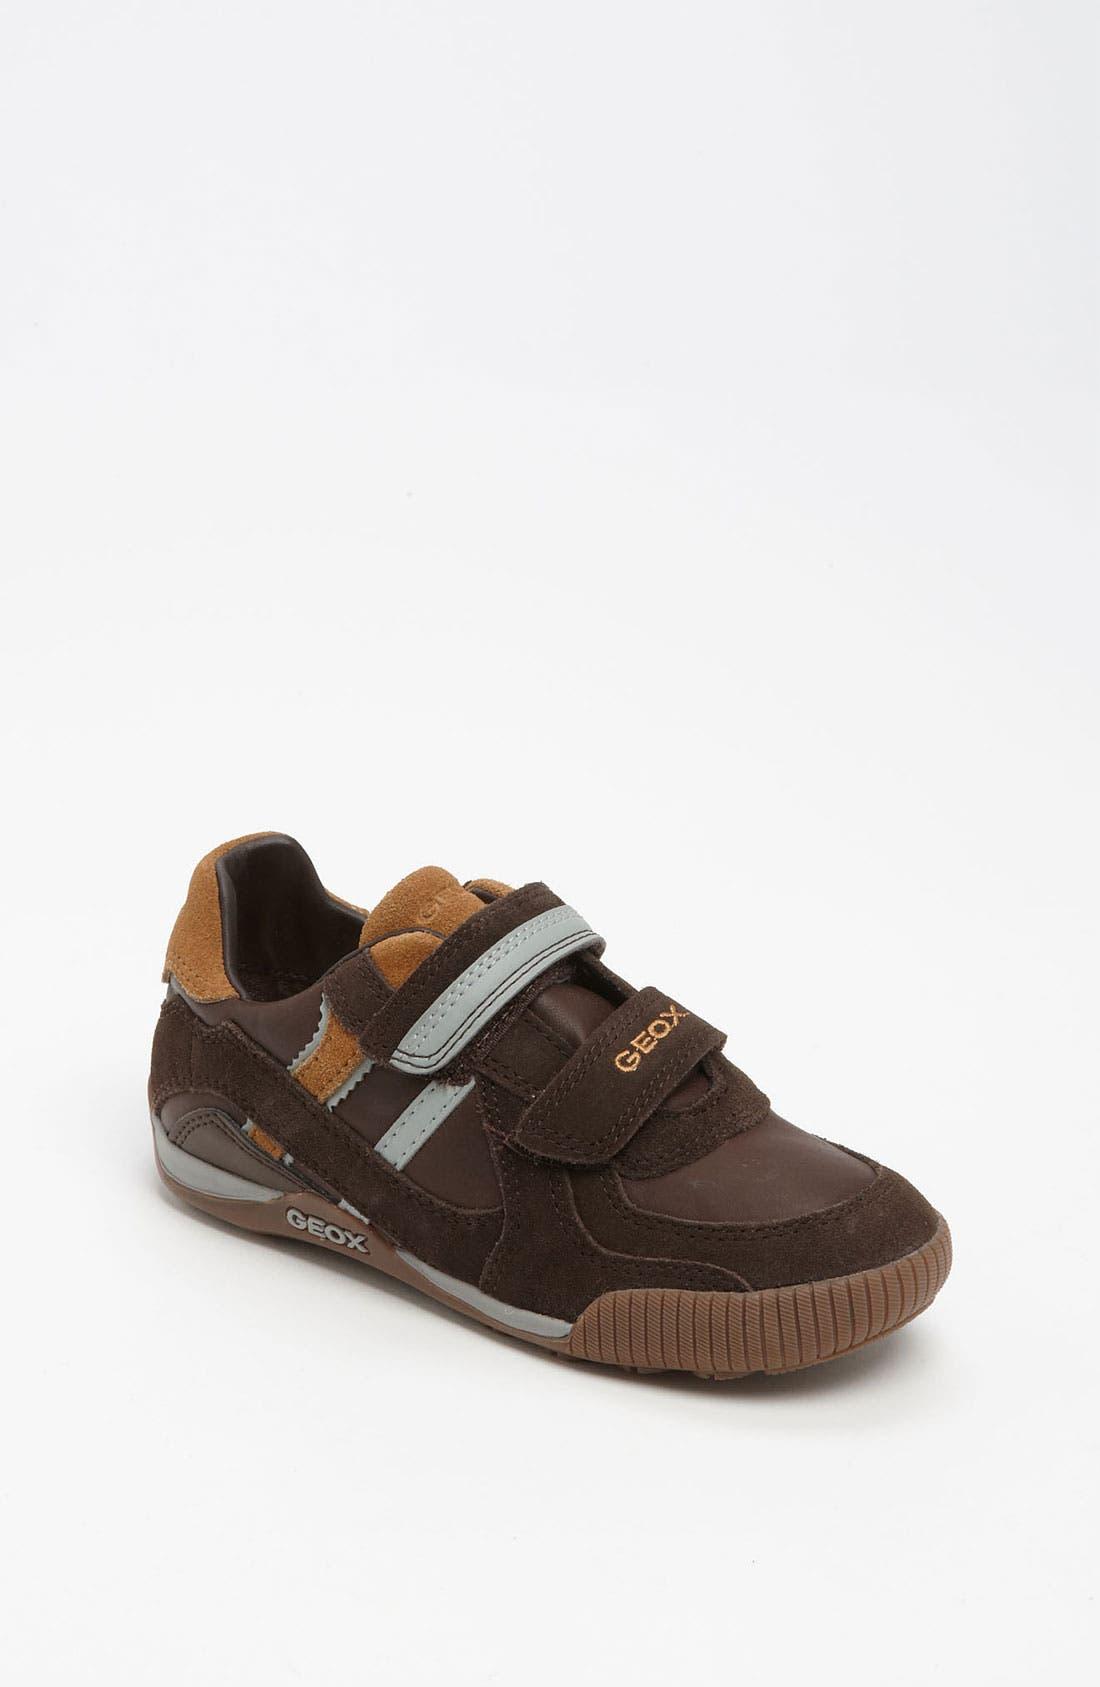 Main Image - Geox 'Olimpus' Sneaker (Toddler, Little Kid & Big Kid)